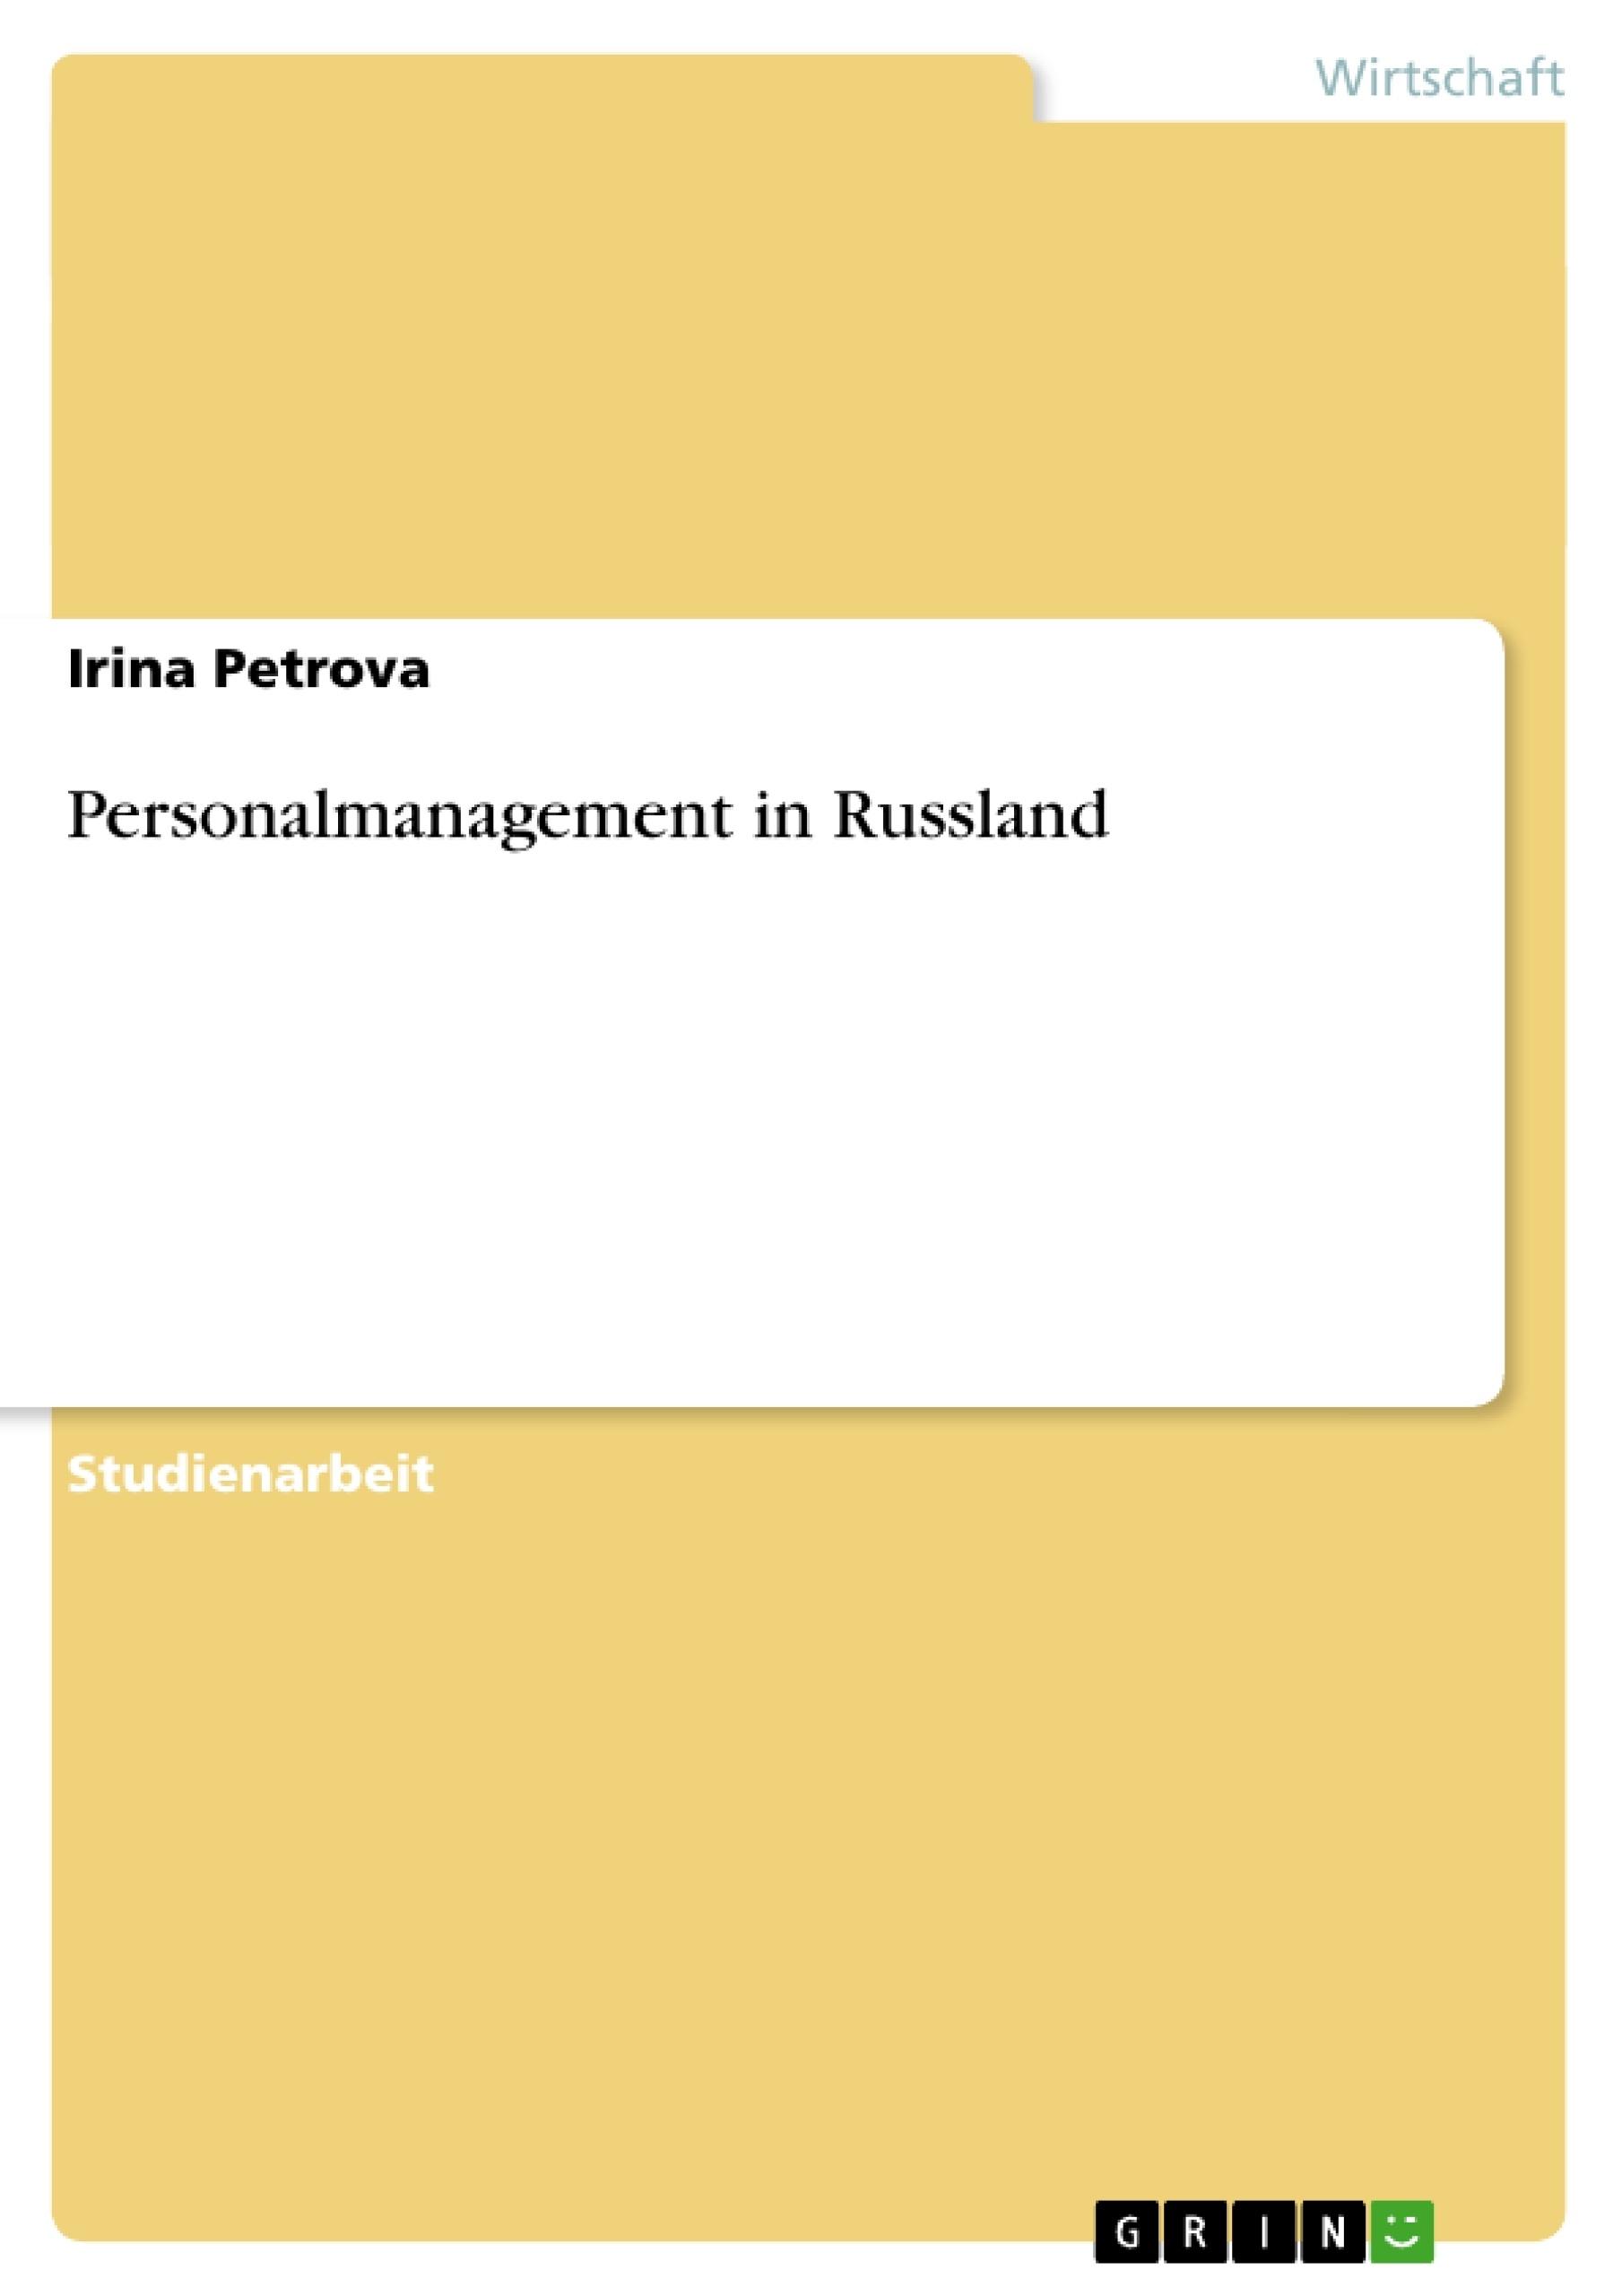 Titel: Personalmanagement in Russland